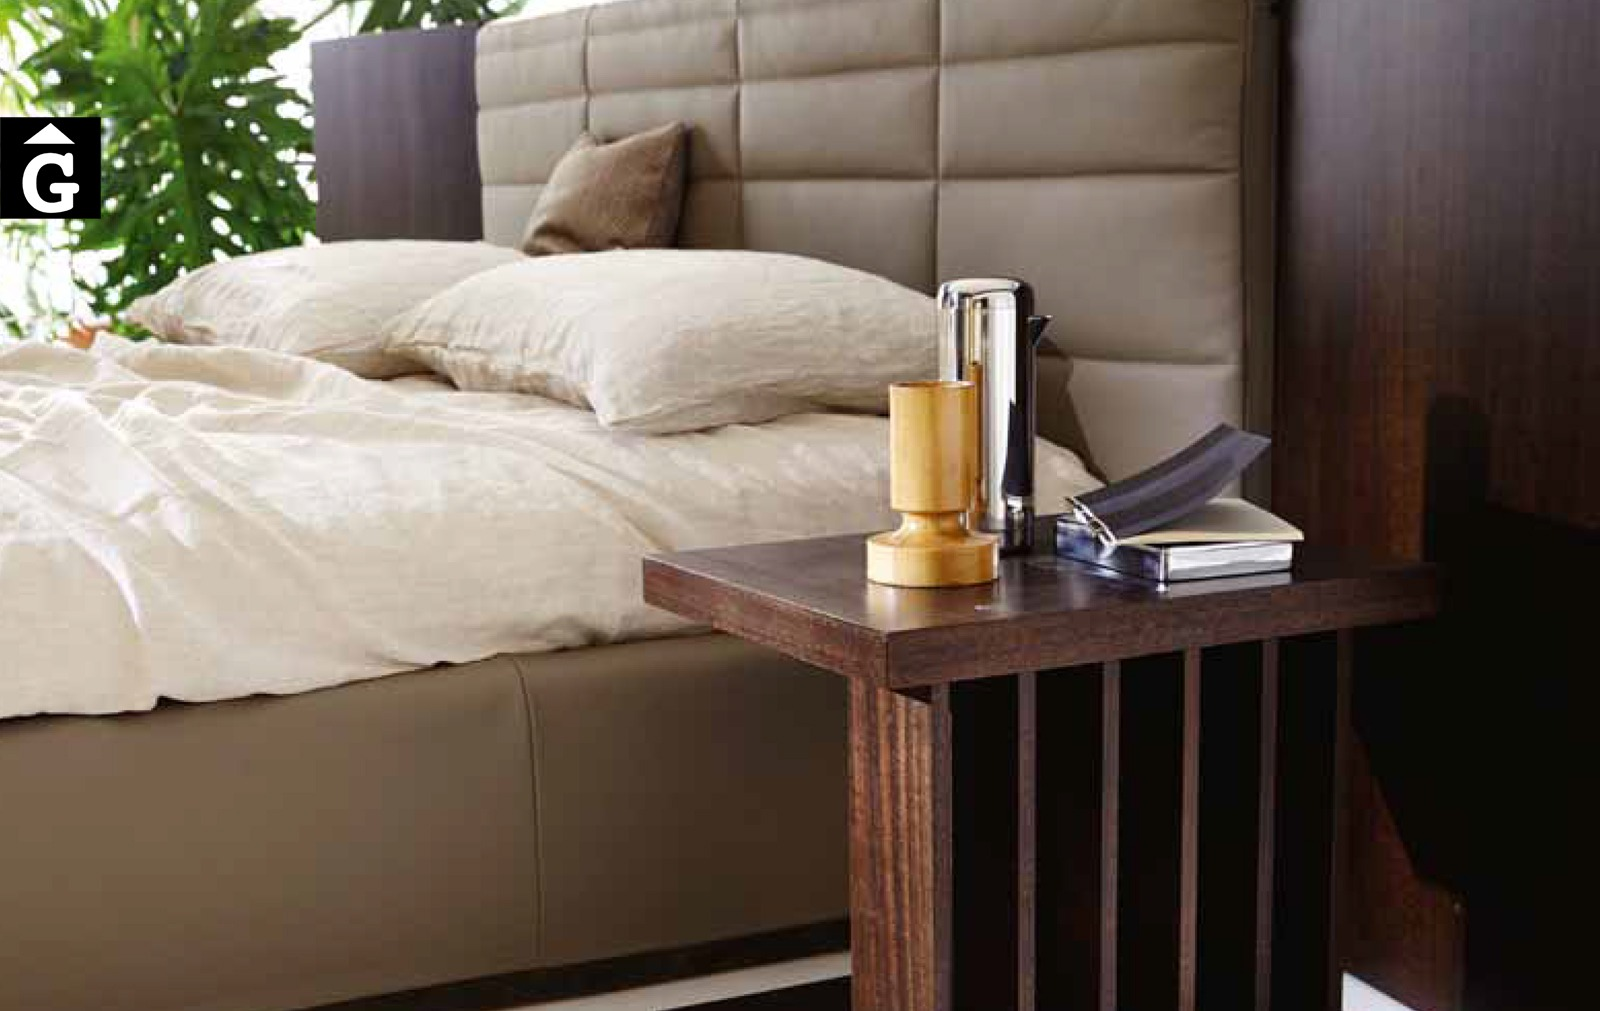 34 1 Grandanlogo detall tauleta – Ditre Italia llits entapissats disseny i qualitat alta by mobles Gifreu